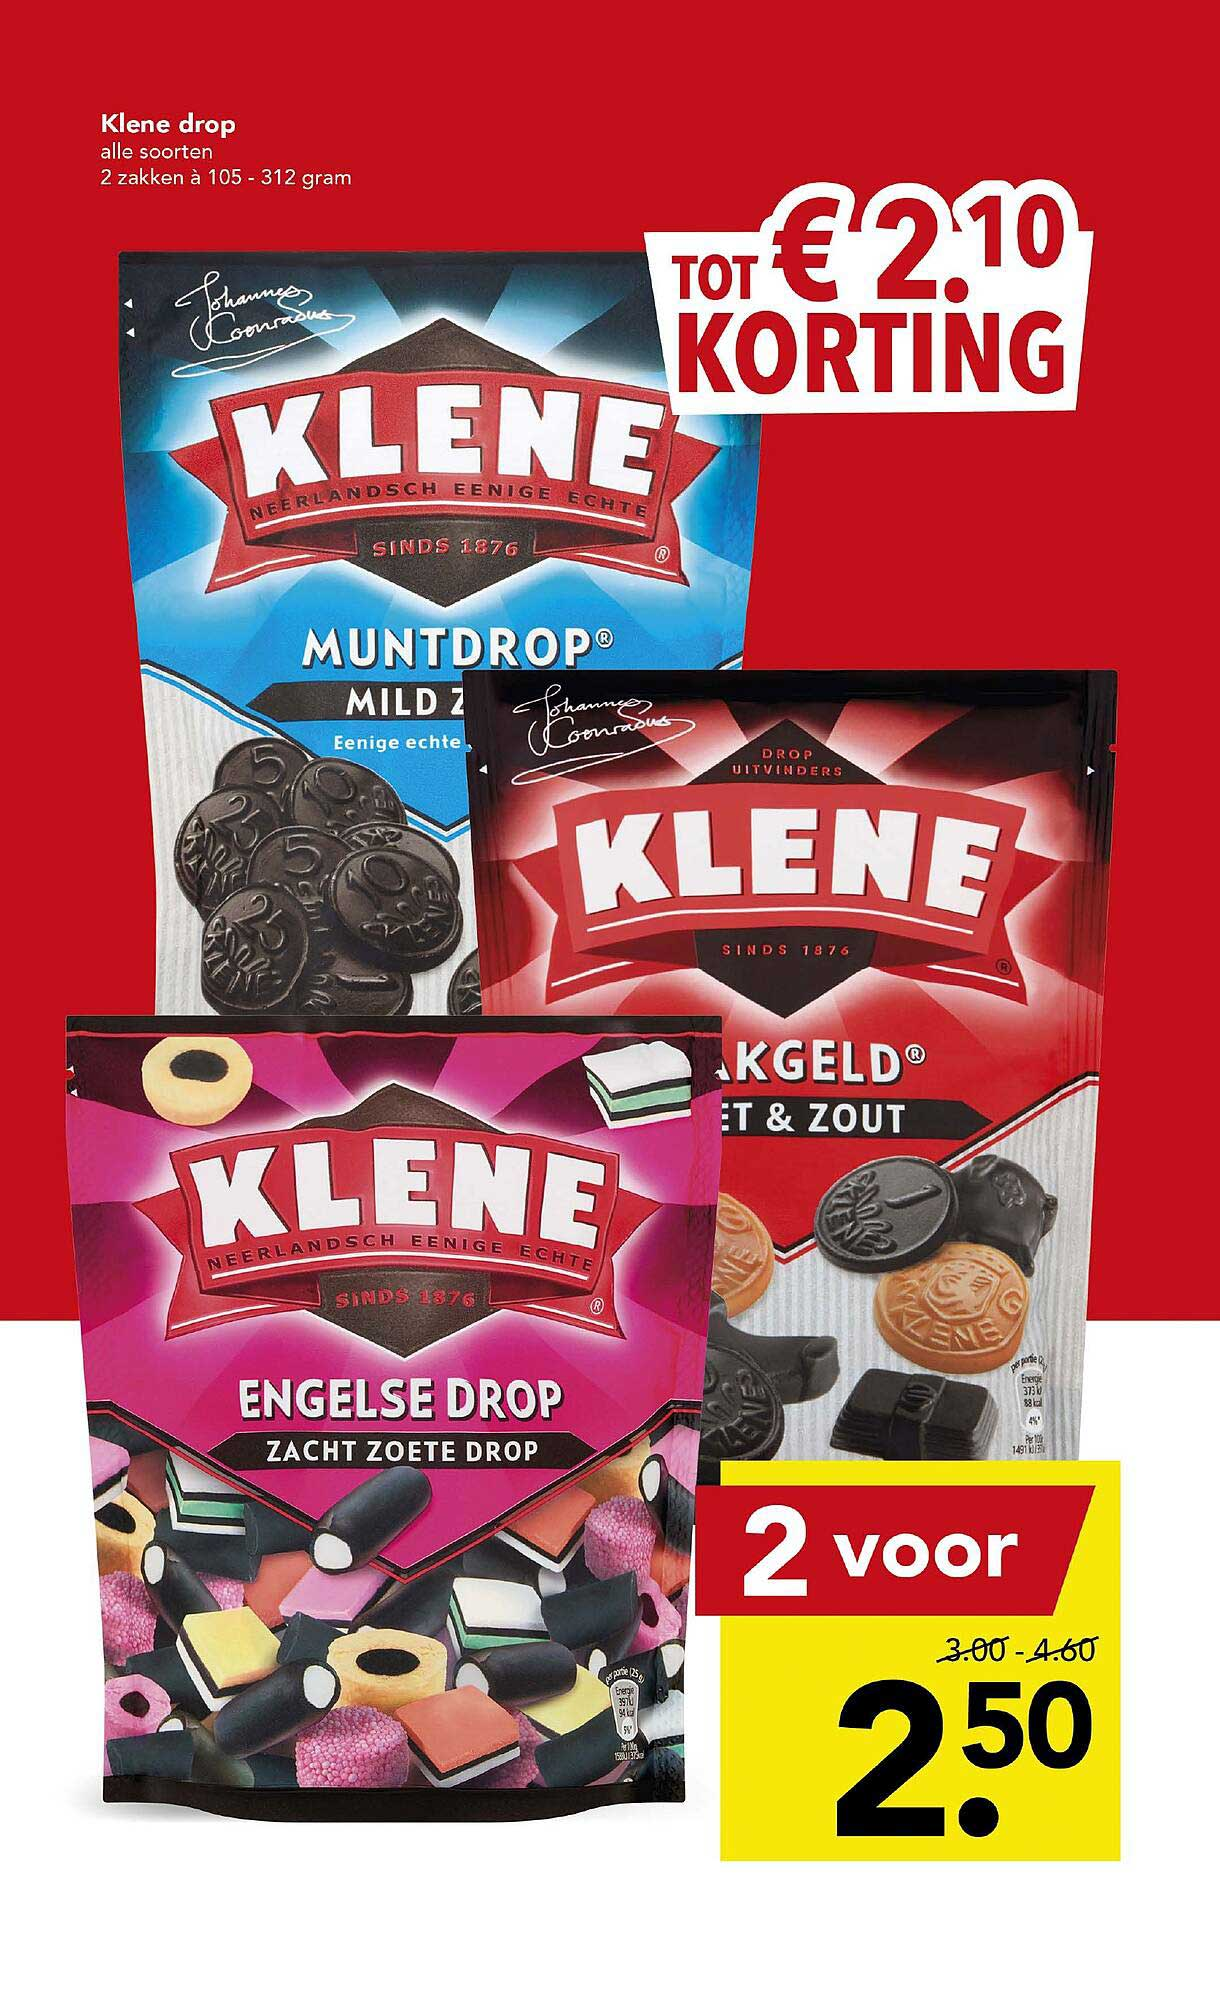 DEEN Klene Drop Tot € 2.10 Korting